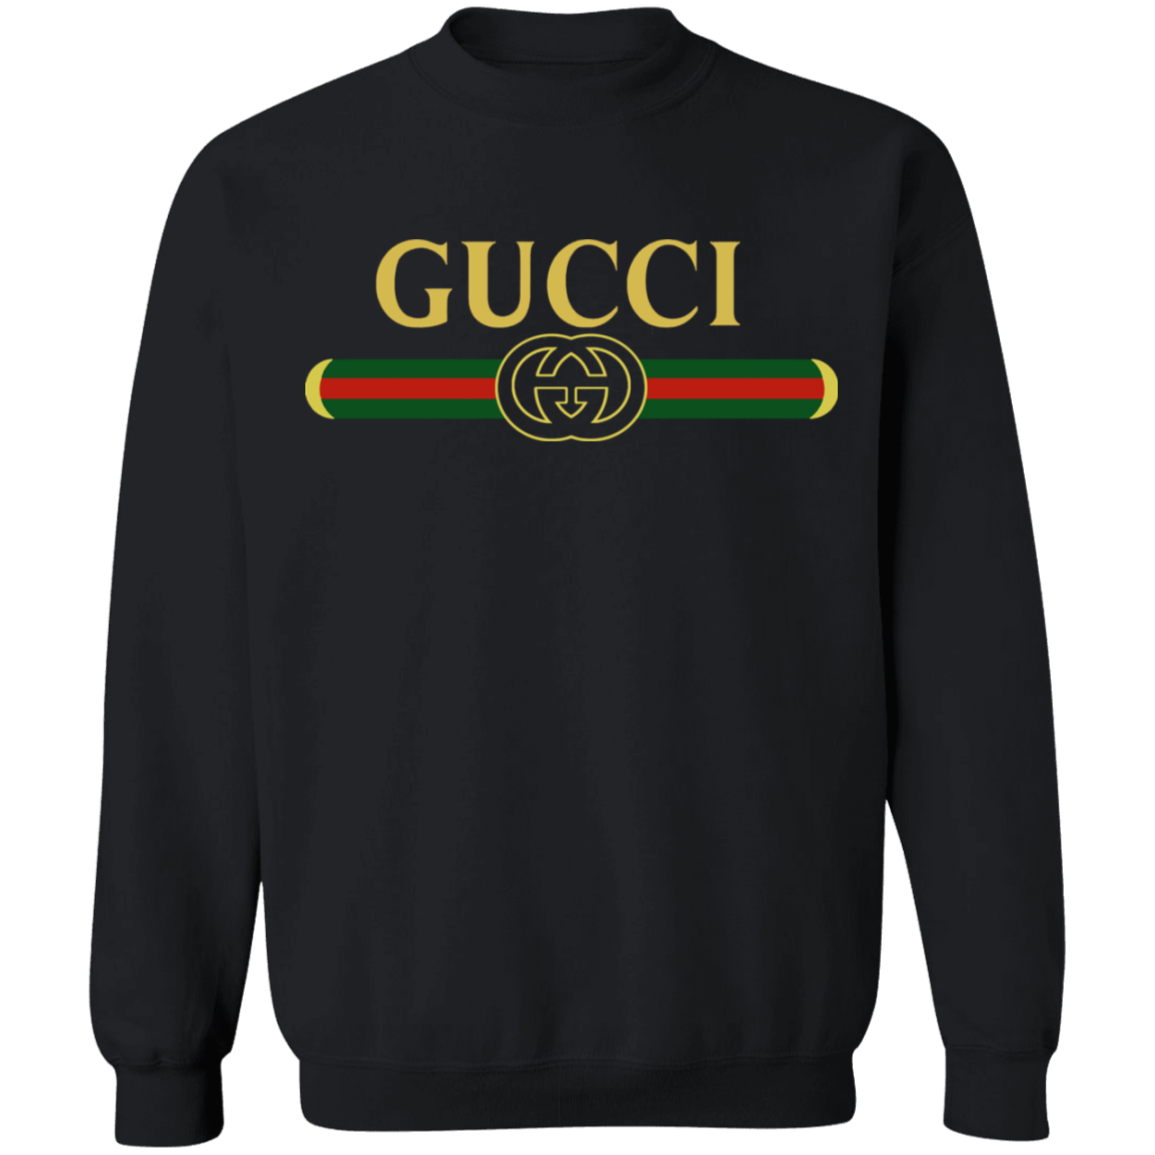 Gucci Logo Vintage For Men Women Youth Inspired Sweatshirt